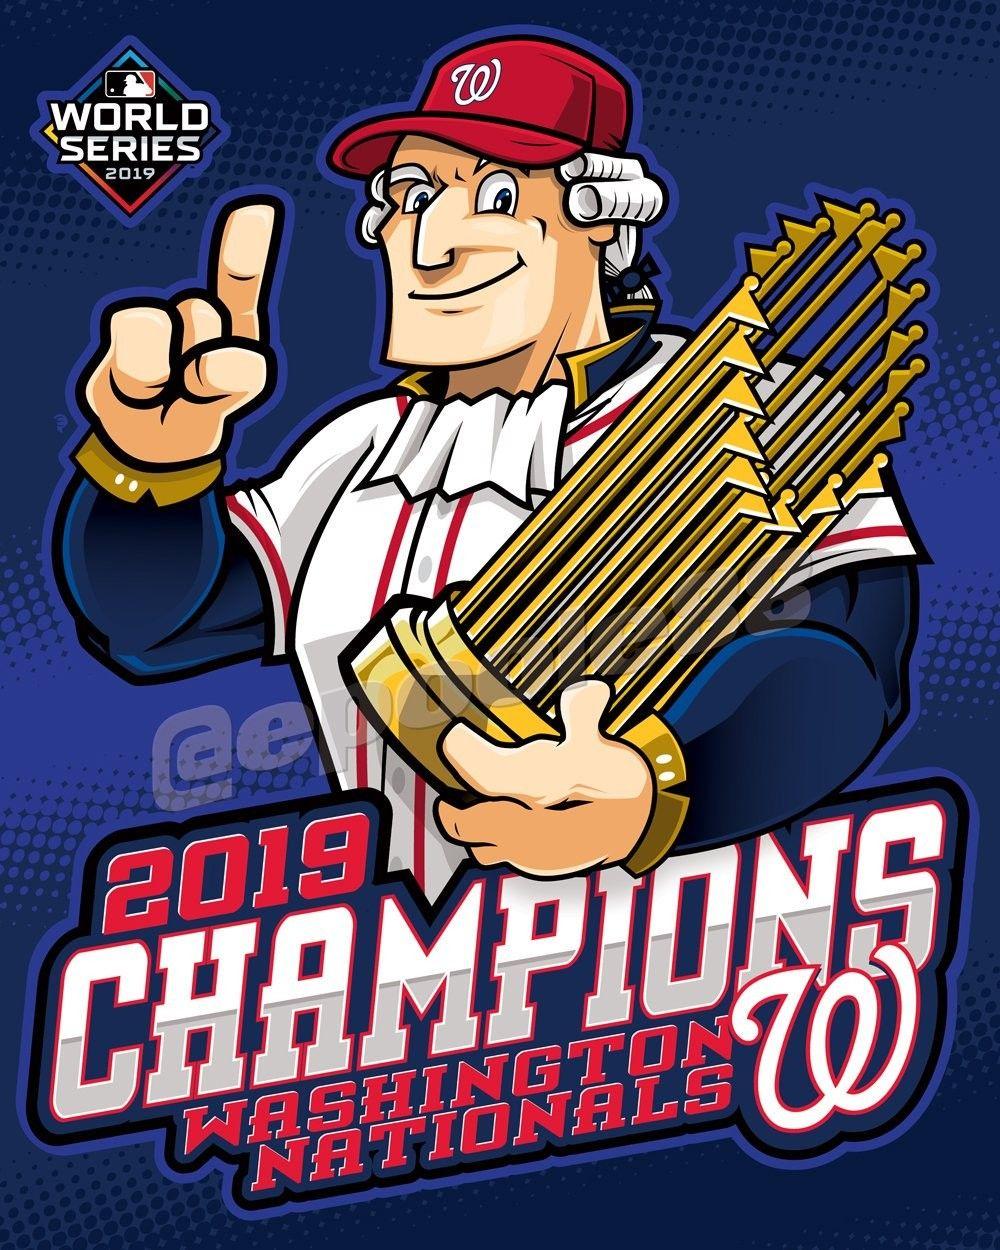 Pin By Rob Sydell On Major League Baseball Mlb In 2020 Washington Nationals Baseball Washington Nationals Baseball Humor